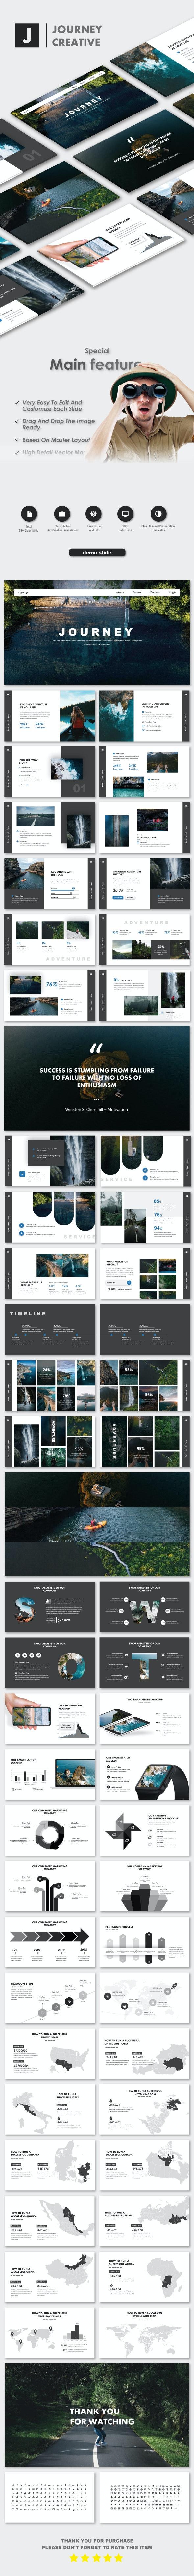 Journey Creative Google Slide Templates - Google Slides Presentation Templates